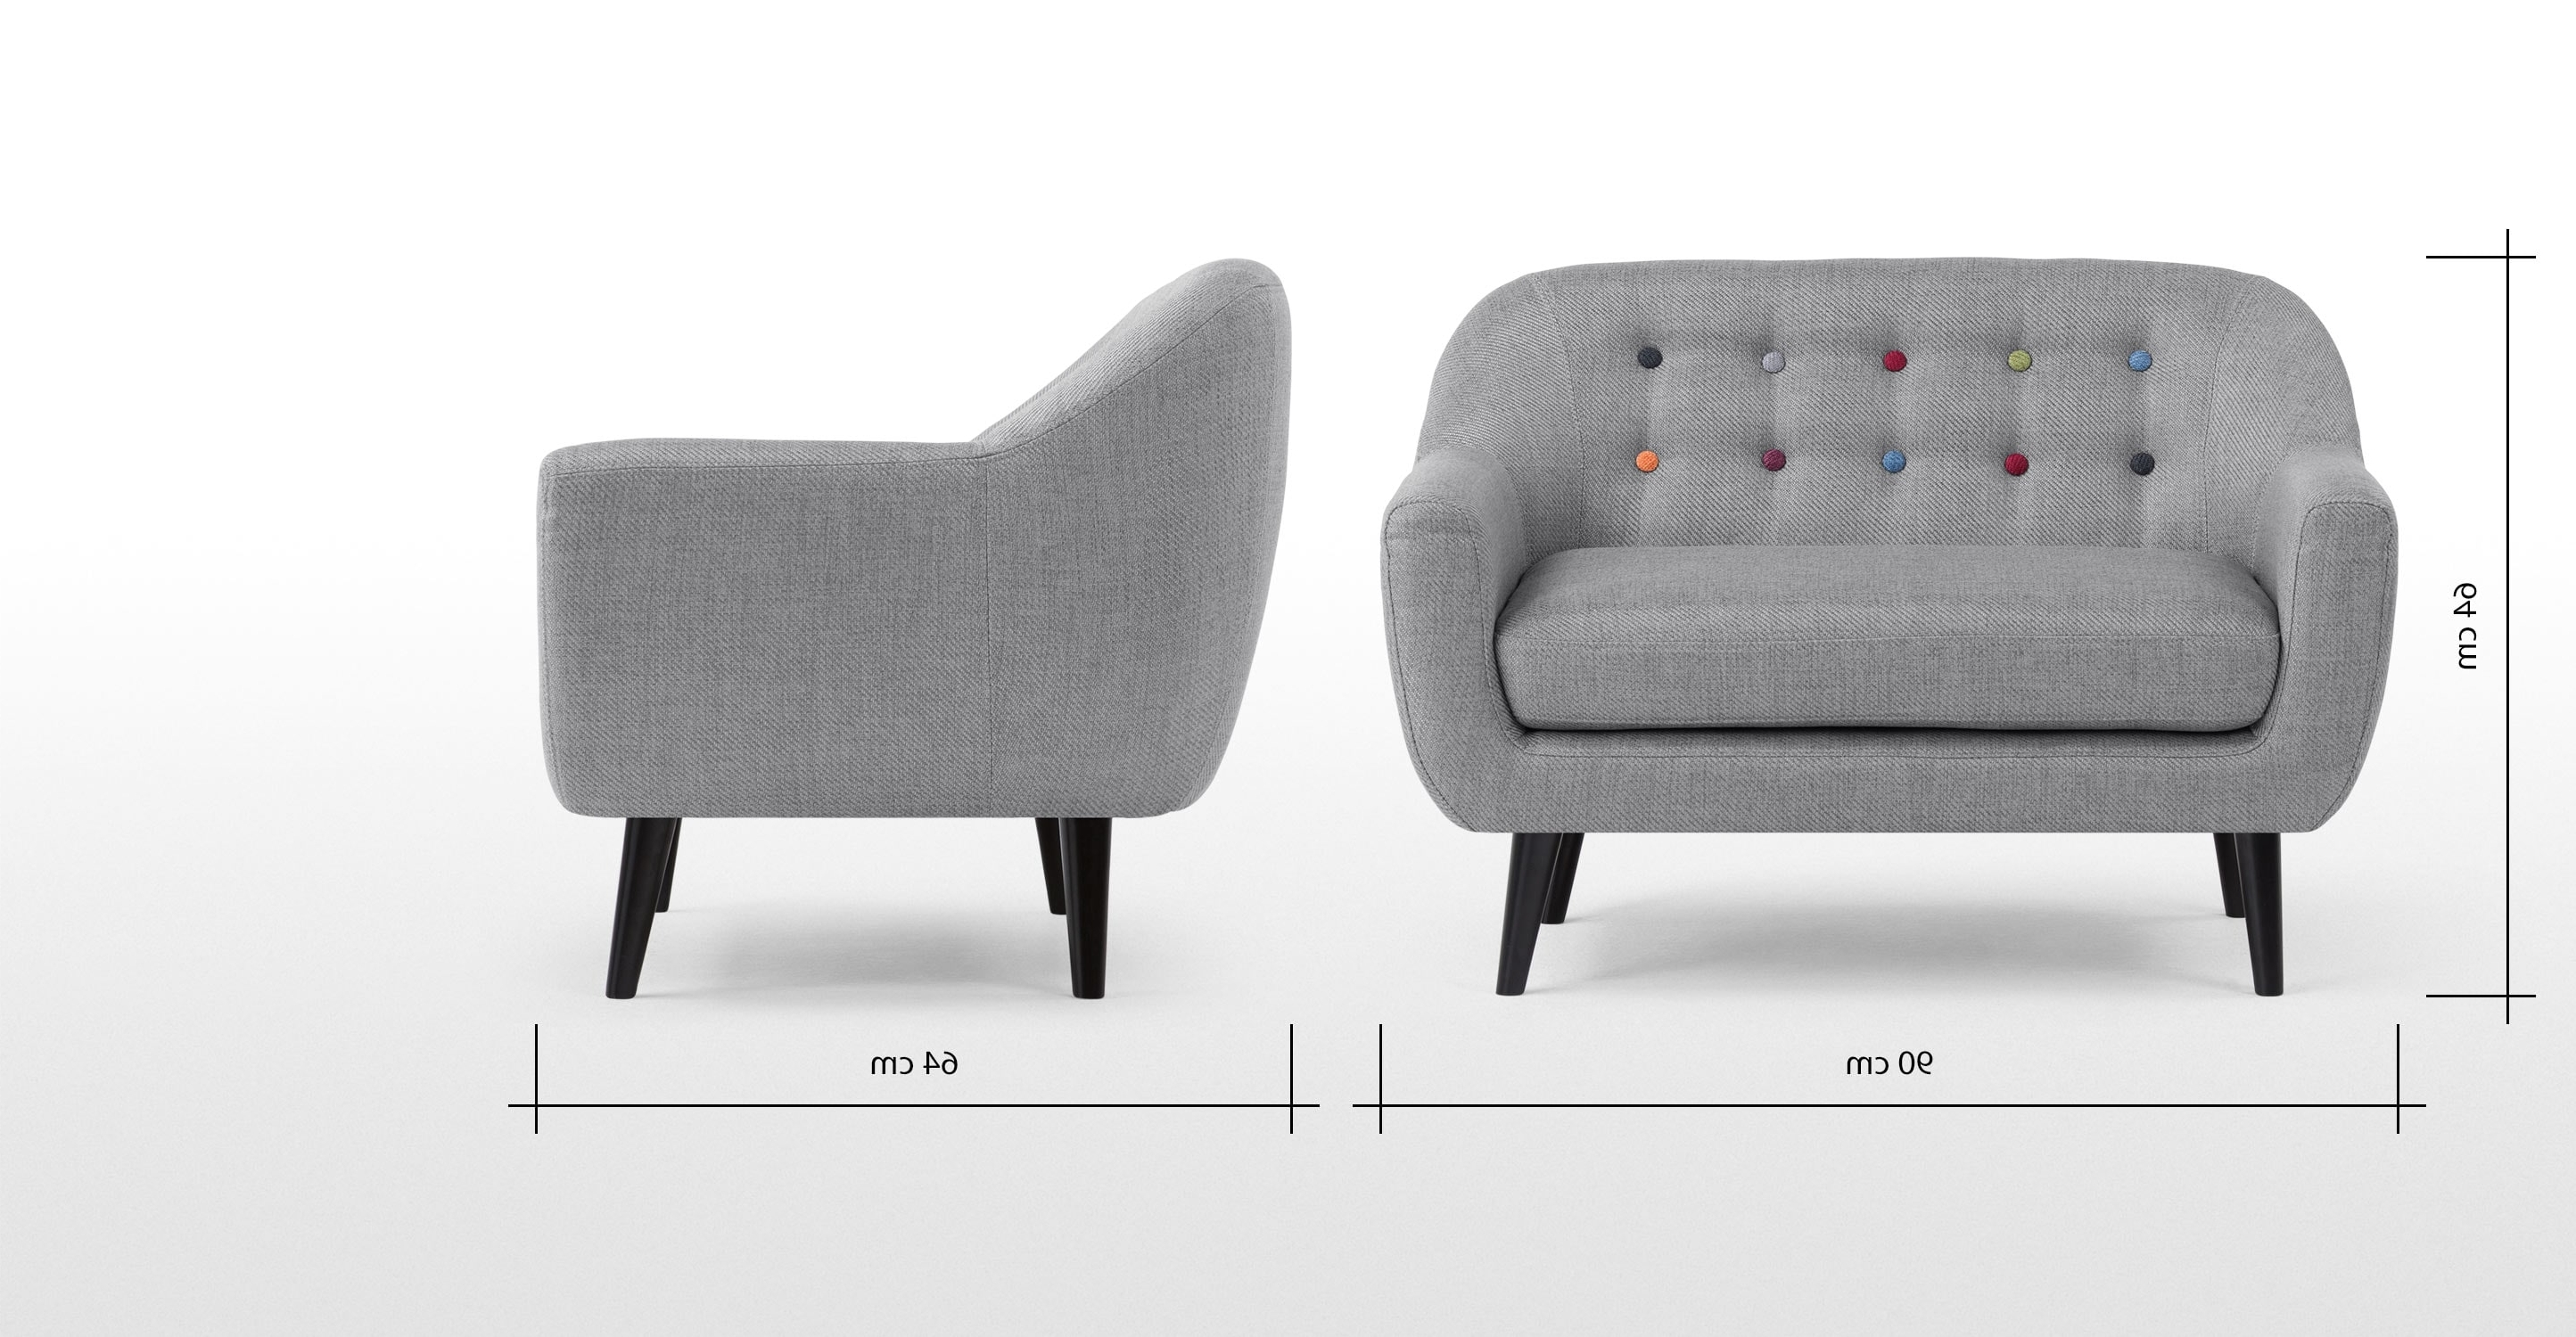 Mini Sofas Regarding Most Popular Awesome Mini Sofa 78 In Modern Sofa Ideas With Mini Sofa (View 8 of 20)